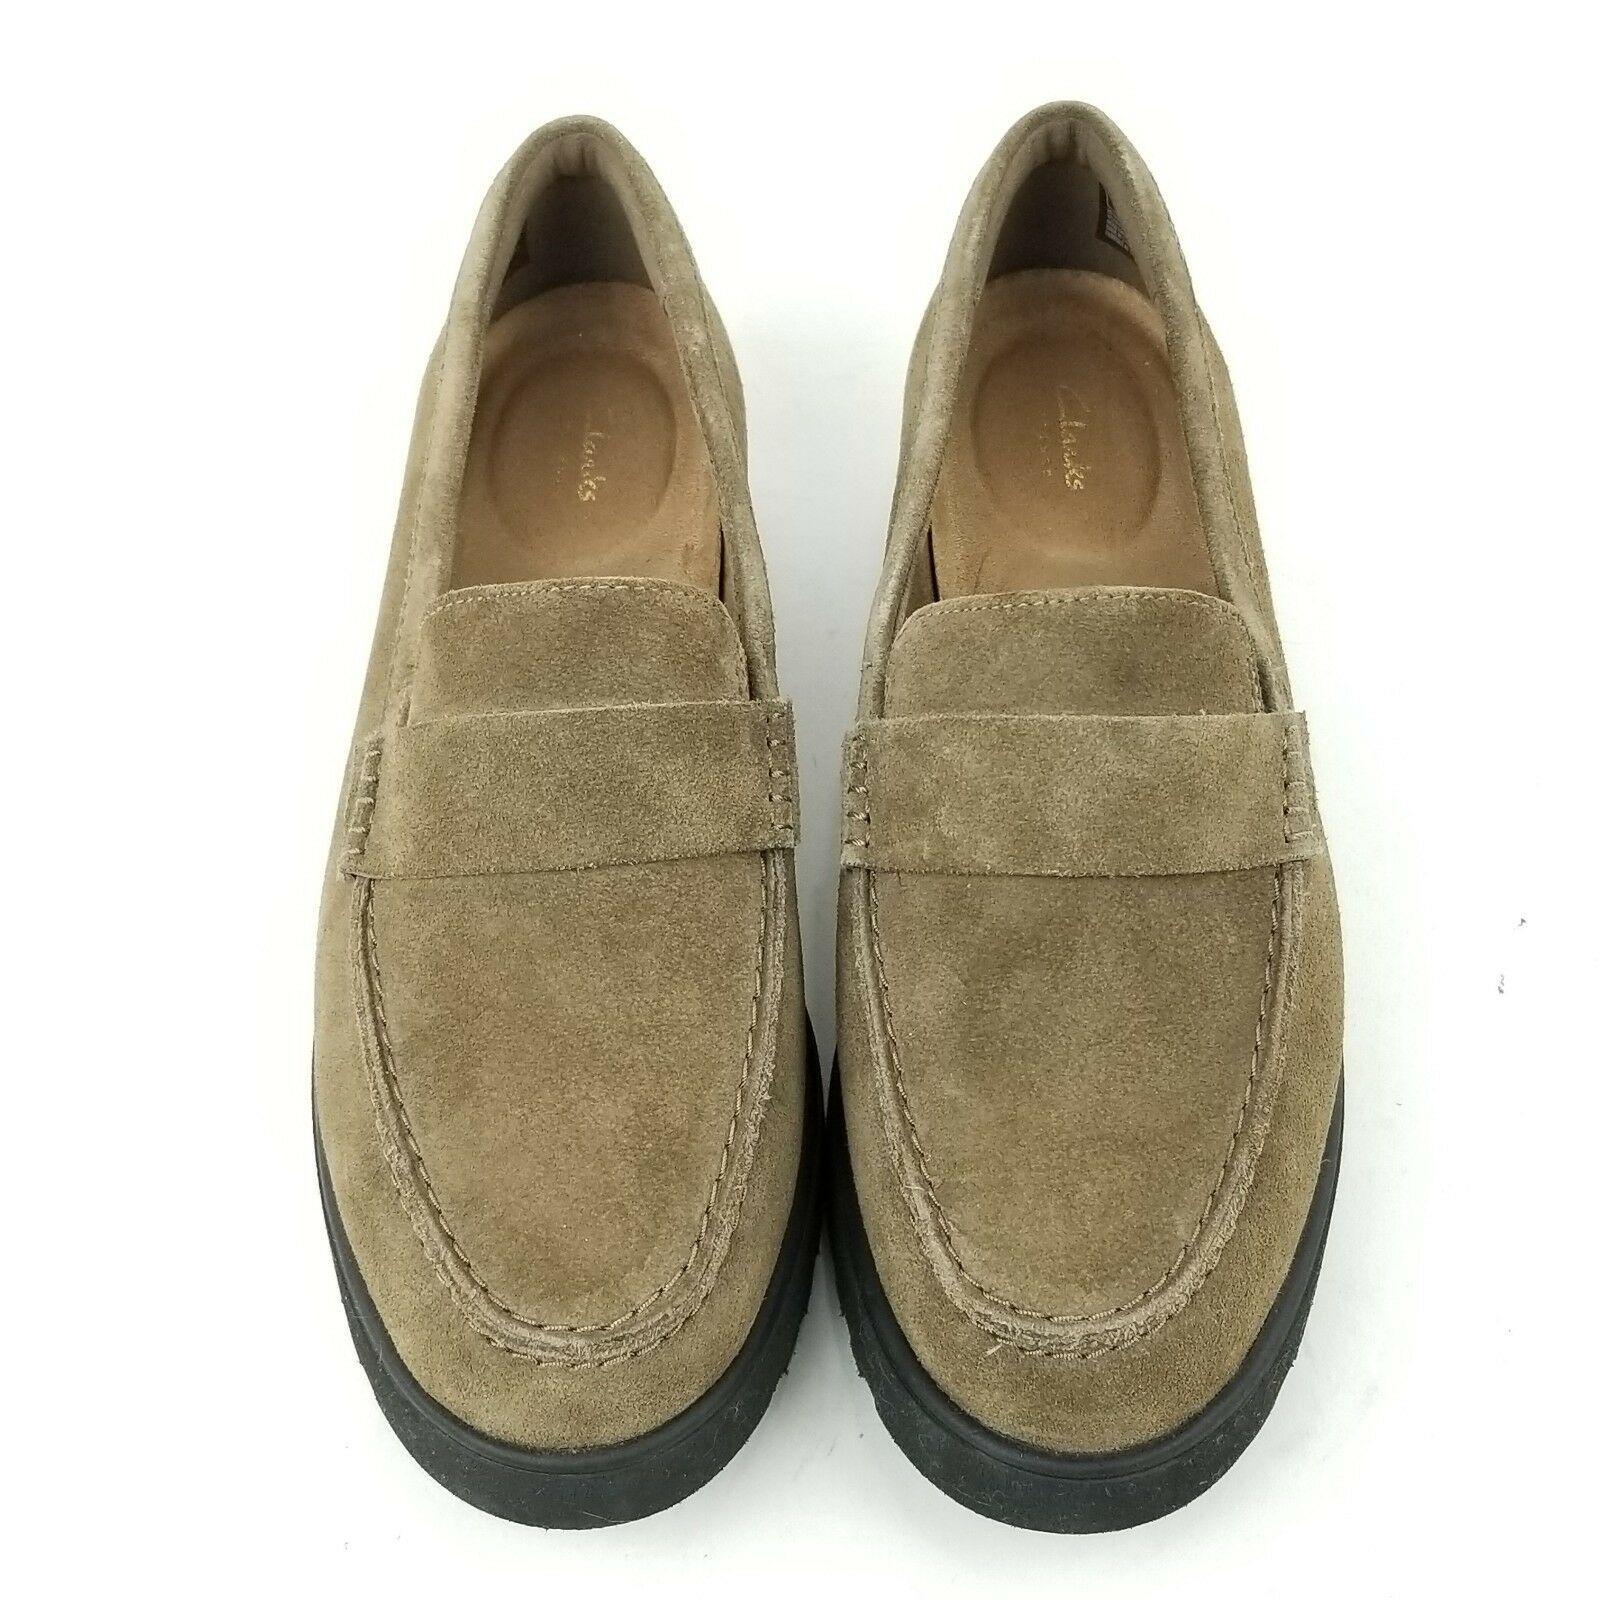 Clarks Artisan Bellevue Hazen Suede Olive Loafers Slip On Shoes 6.5 W